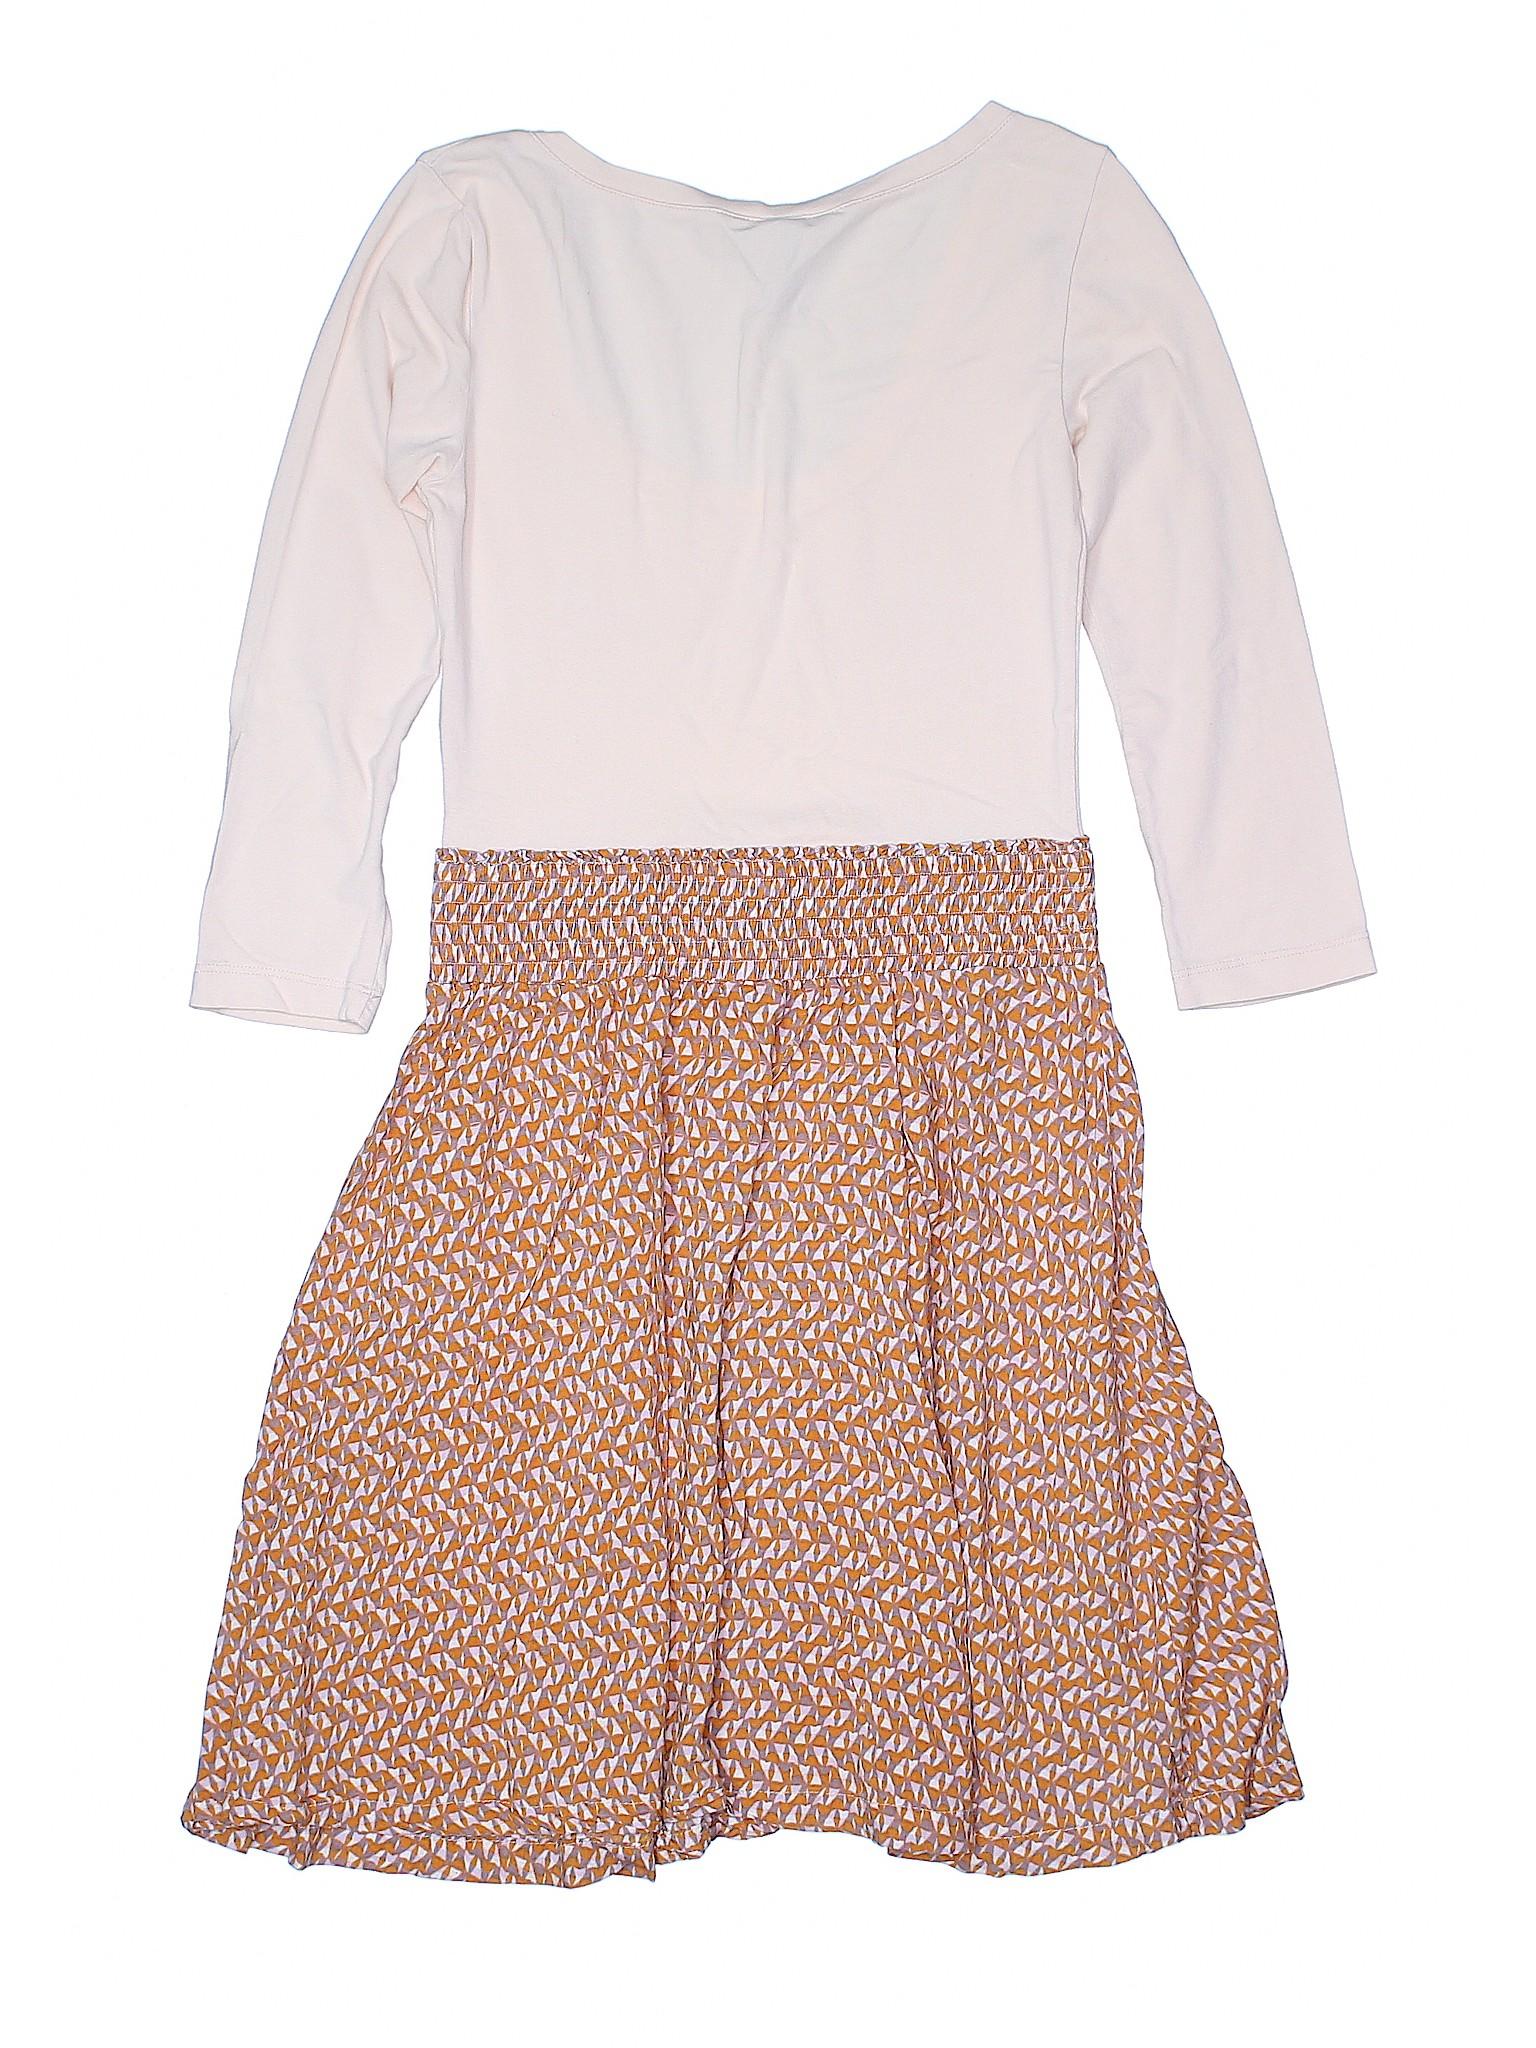 Boutique Casual amp;M Dress H winter 4qxFn4a